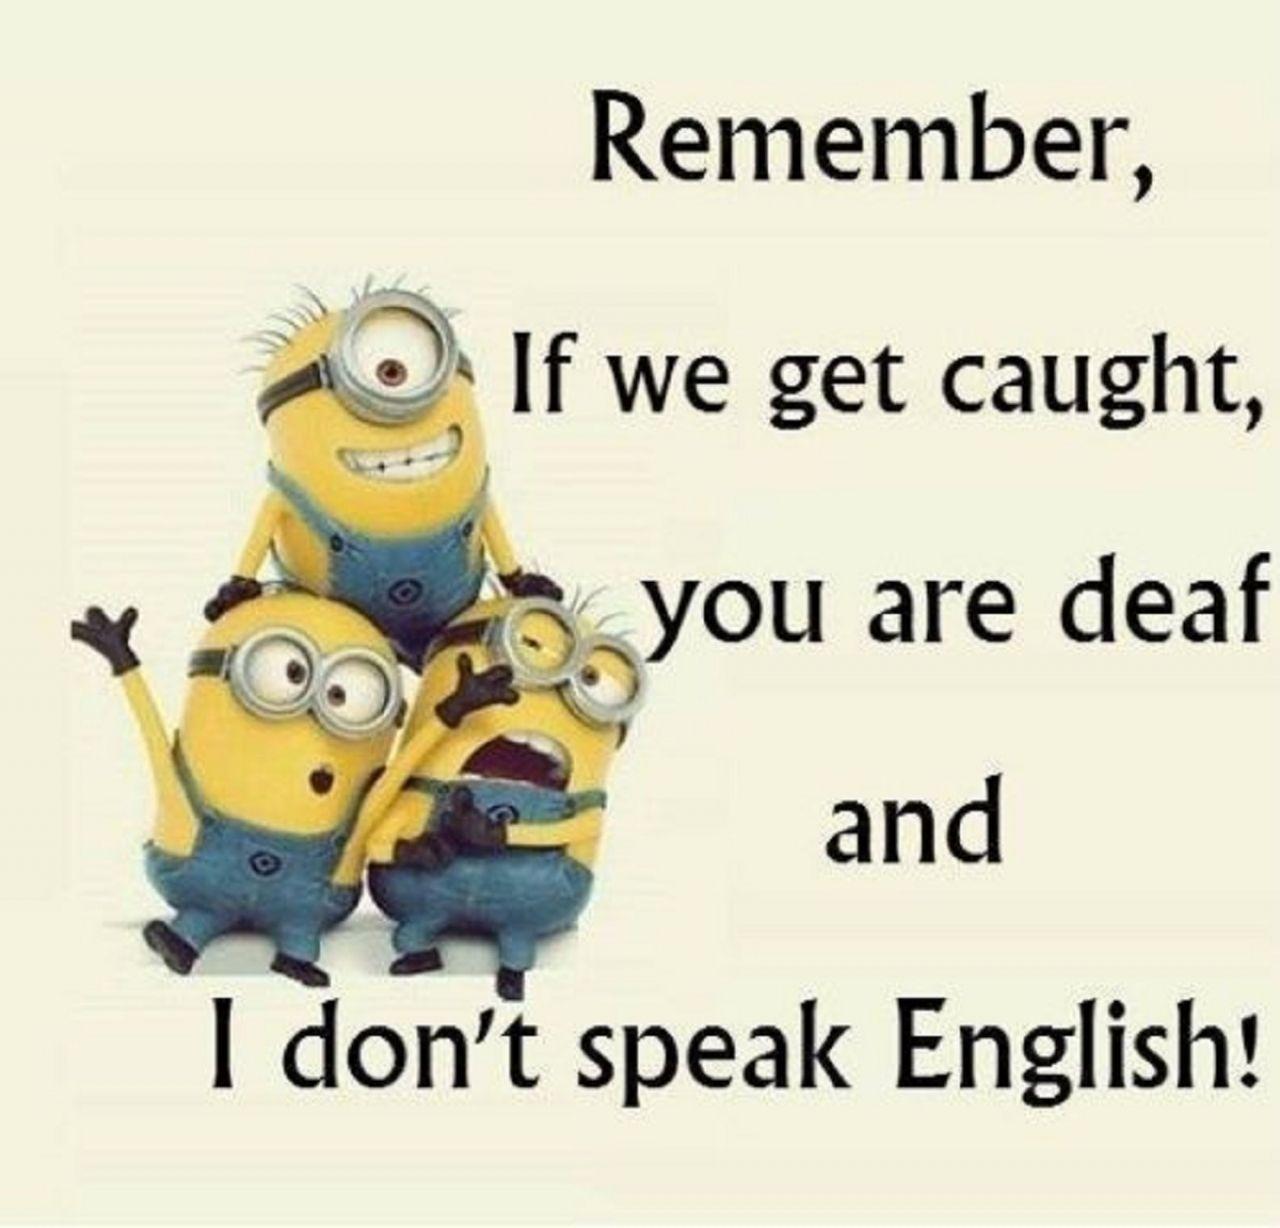 Minion Friendship Quotes Funny Minion Quotes Minions Funny Minion Jokes